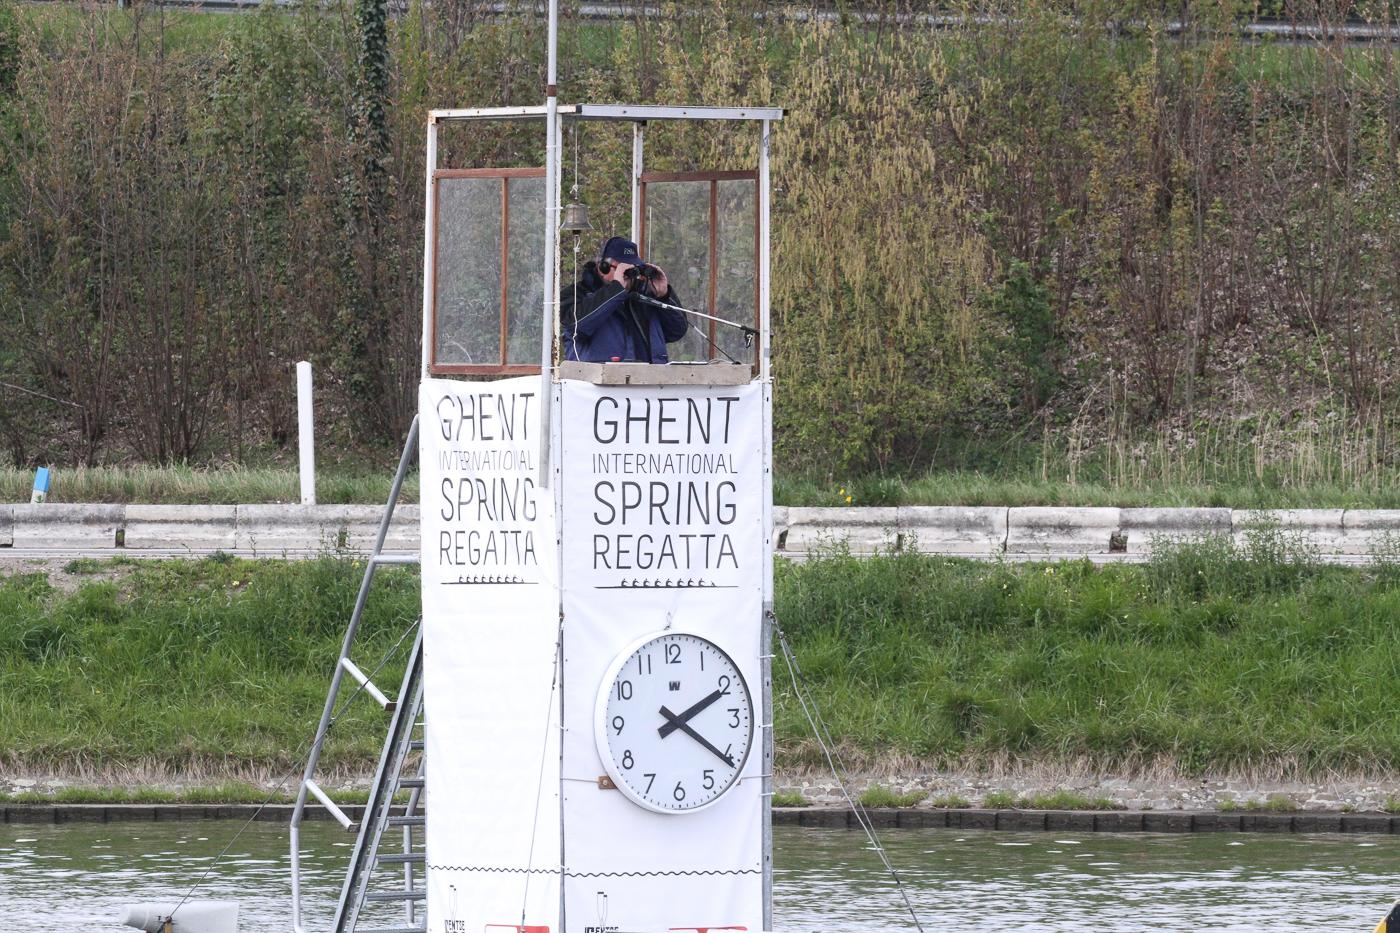 RCT_Gent_2019_032.jpg